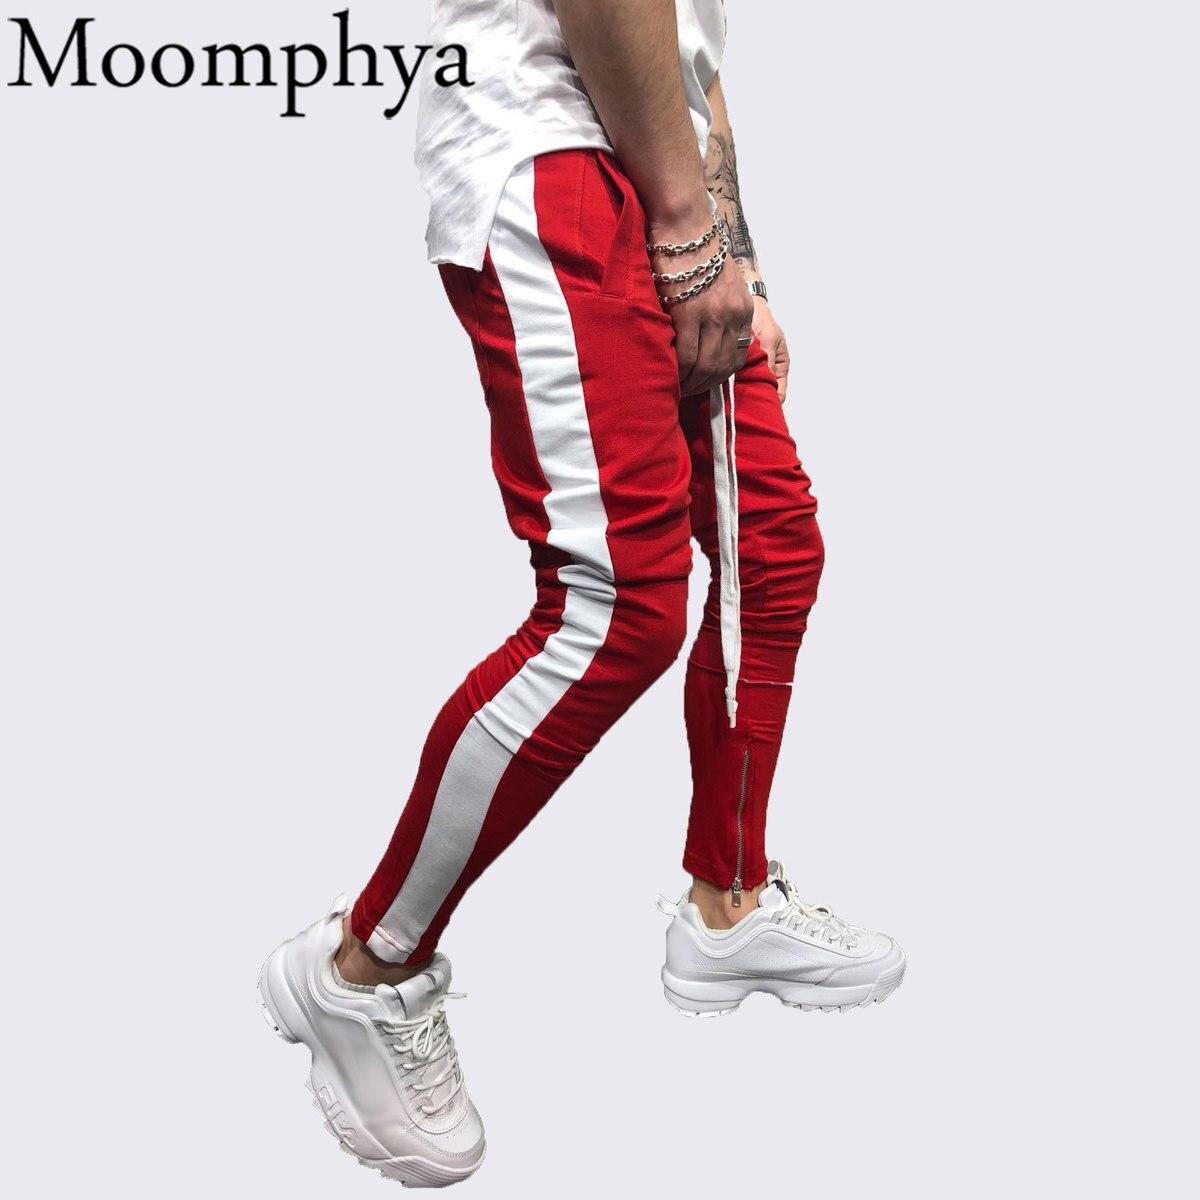 Moomphya Stylish Side Striped Men Joggers Pants Streetwear Hip Hop Men Sweatpants Pantalon Homme Slim Pants Men Zipper Trousers